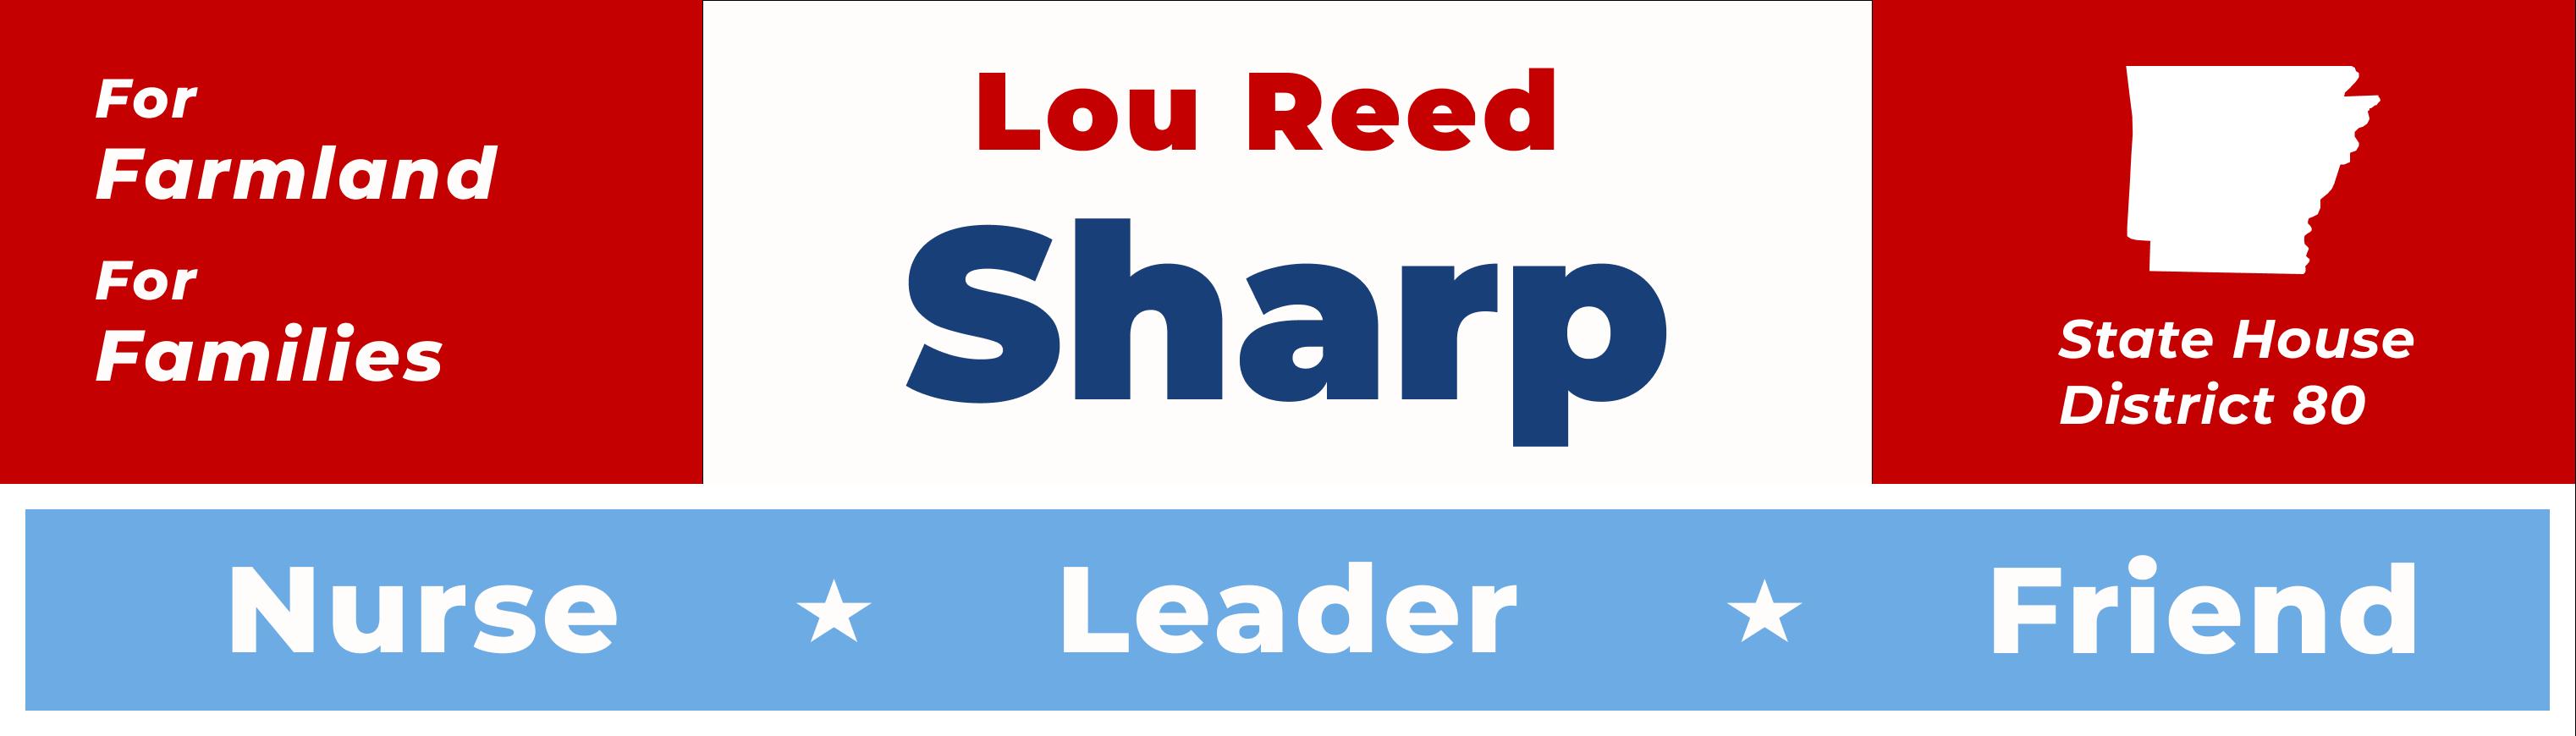 Lou Reed Sharp